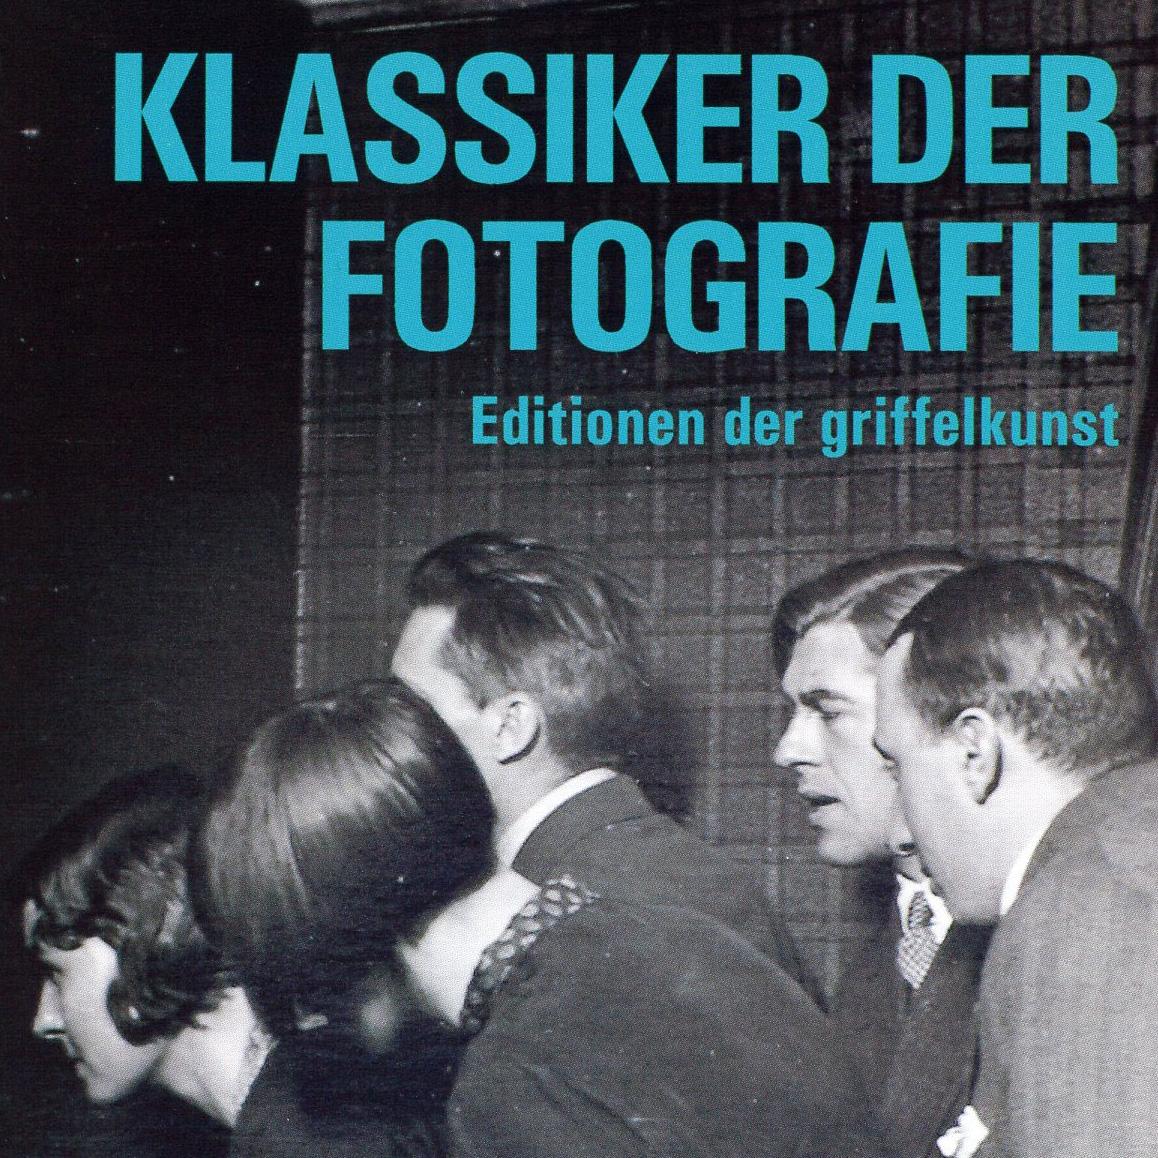 Klassiker der Fotografie